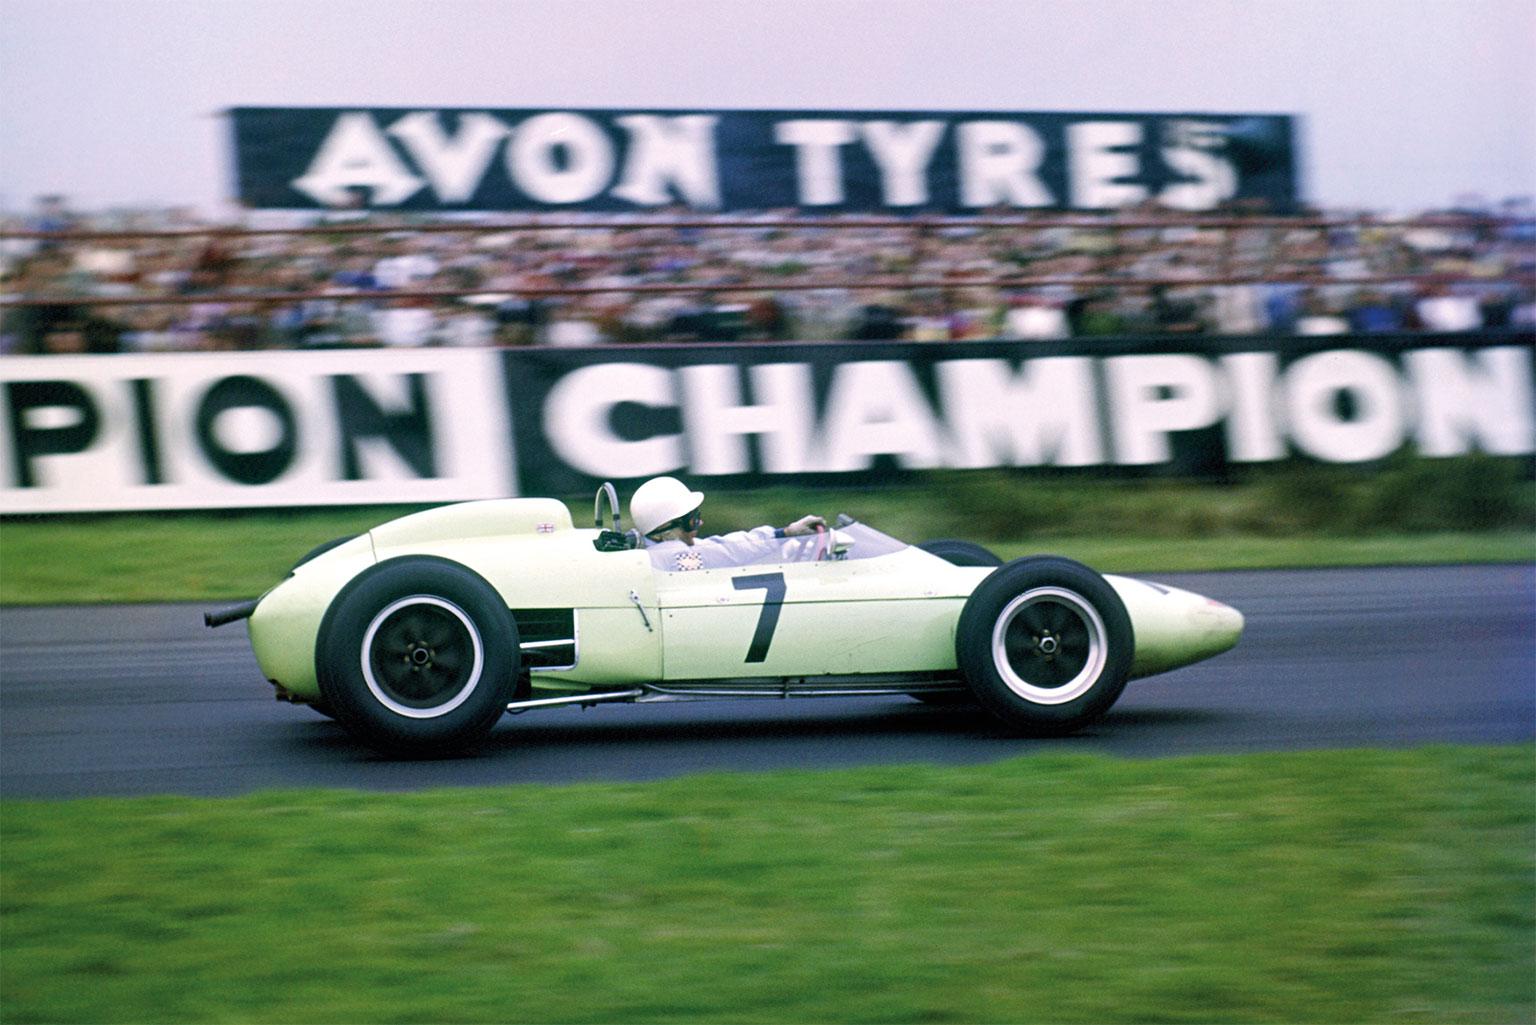 GPL_1962_GOODWOOD_MOSS_LOTUS_18-21_V8_LAST_RACE